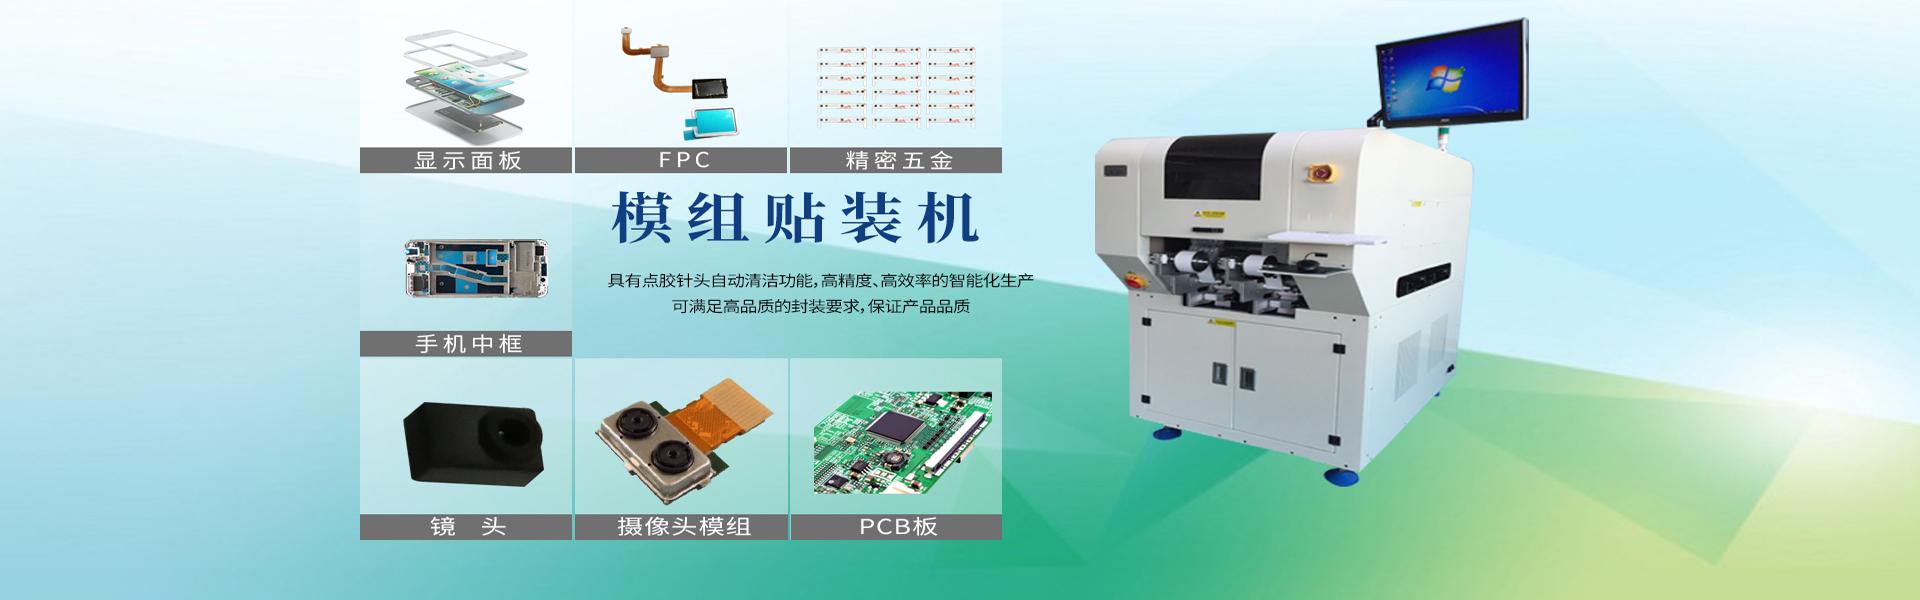 FPC智能贴装机